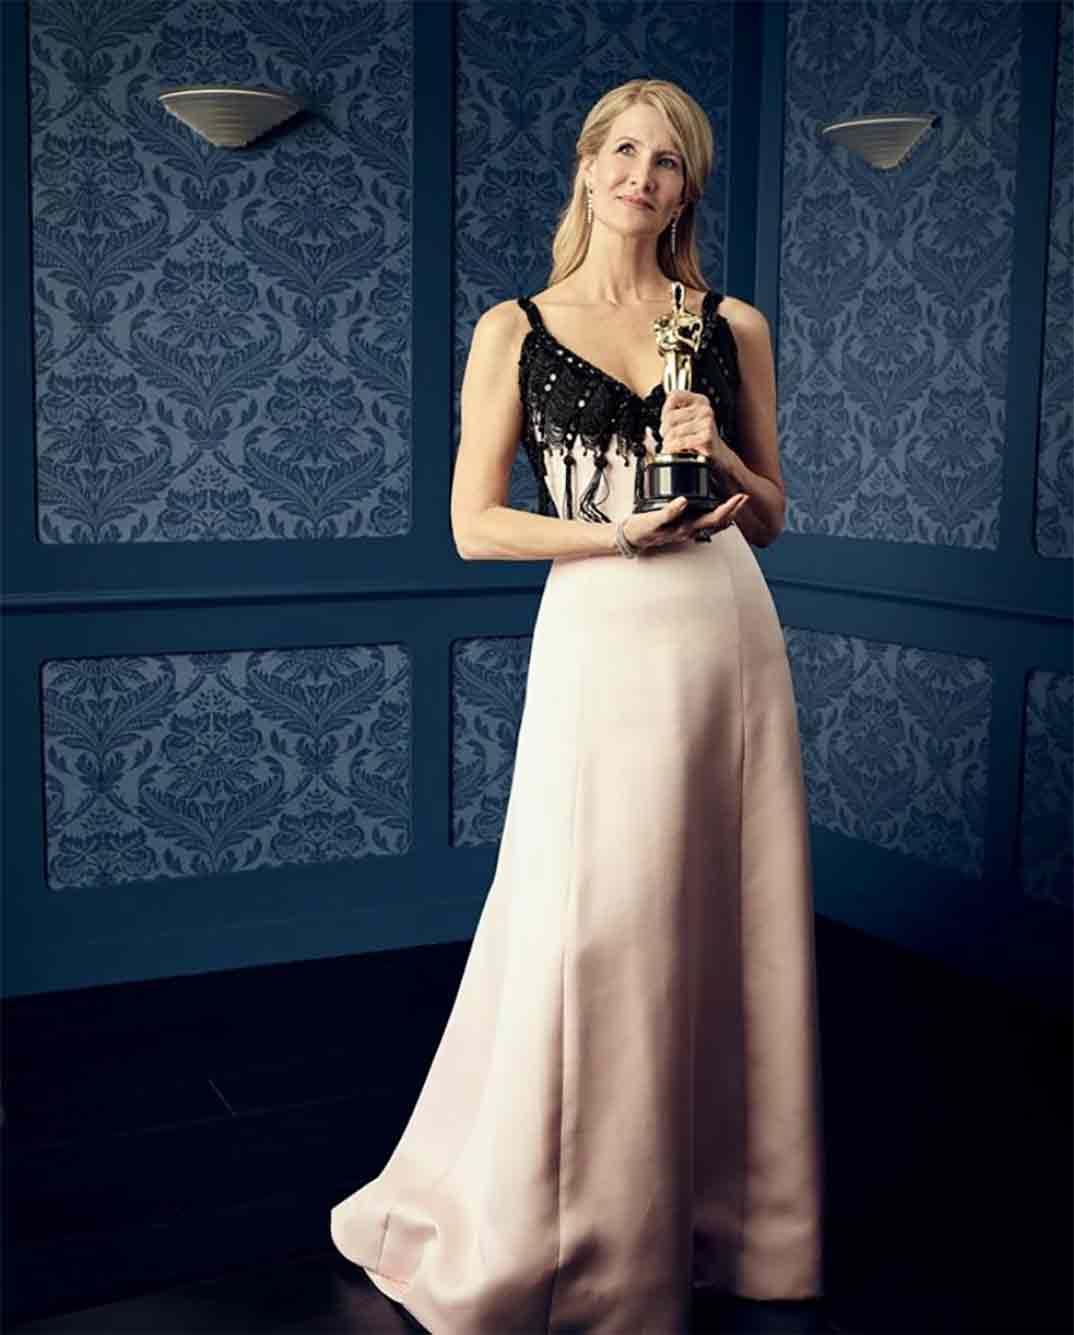 Laura Dern - Mejor Actriz de Reparto - Oscars 2020 ©theacademy/Instagram